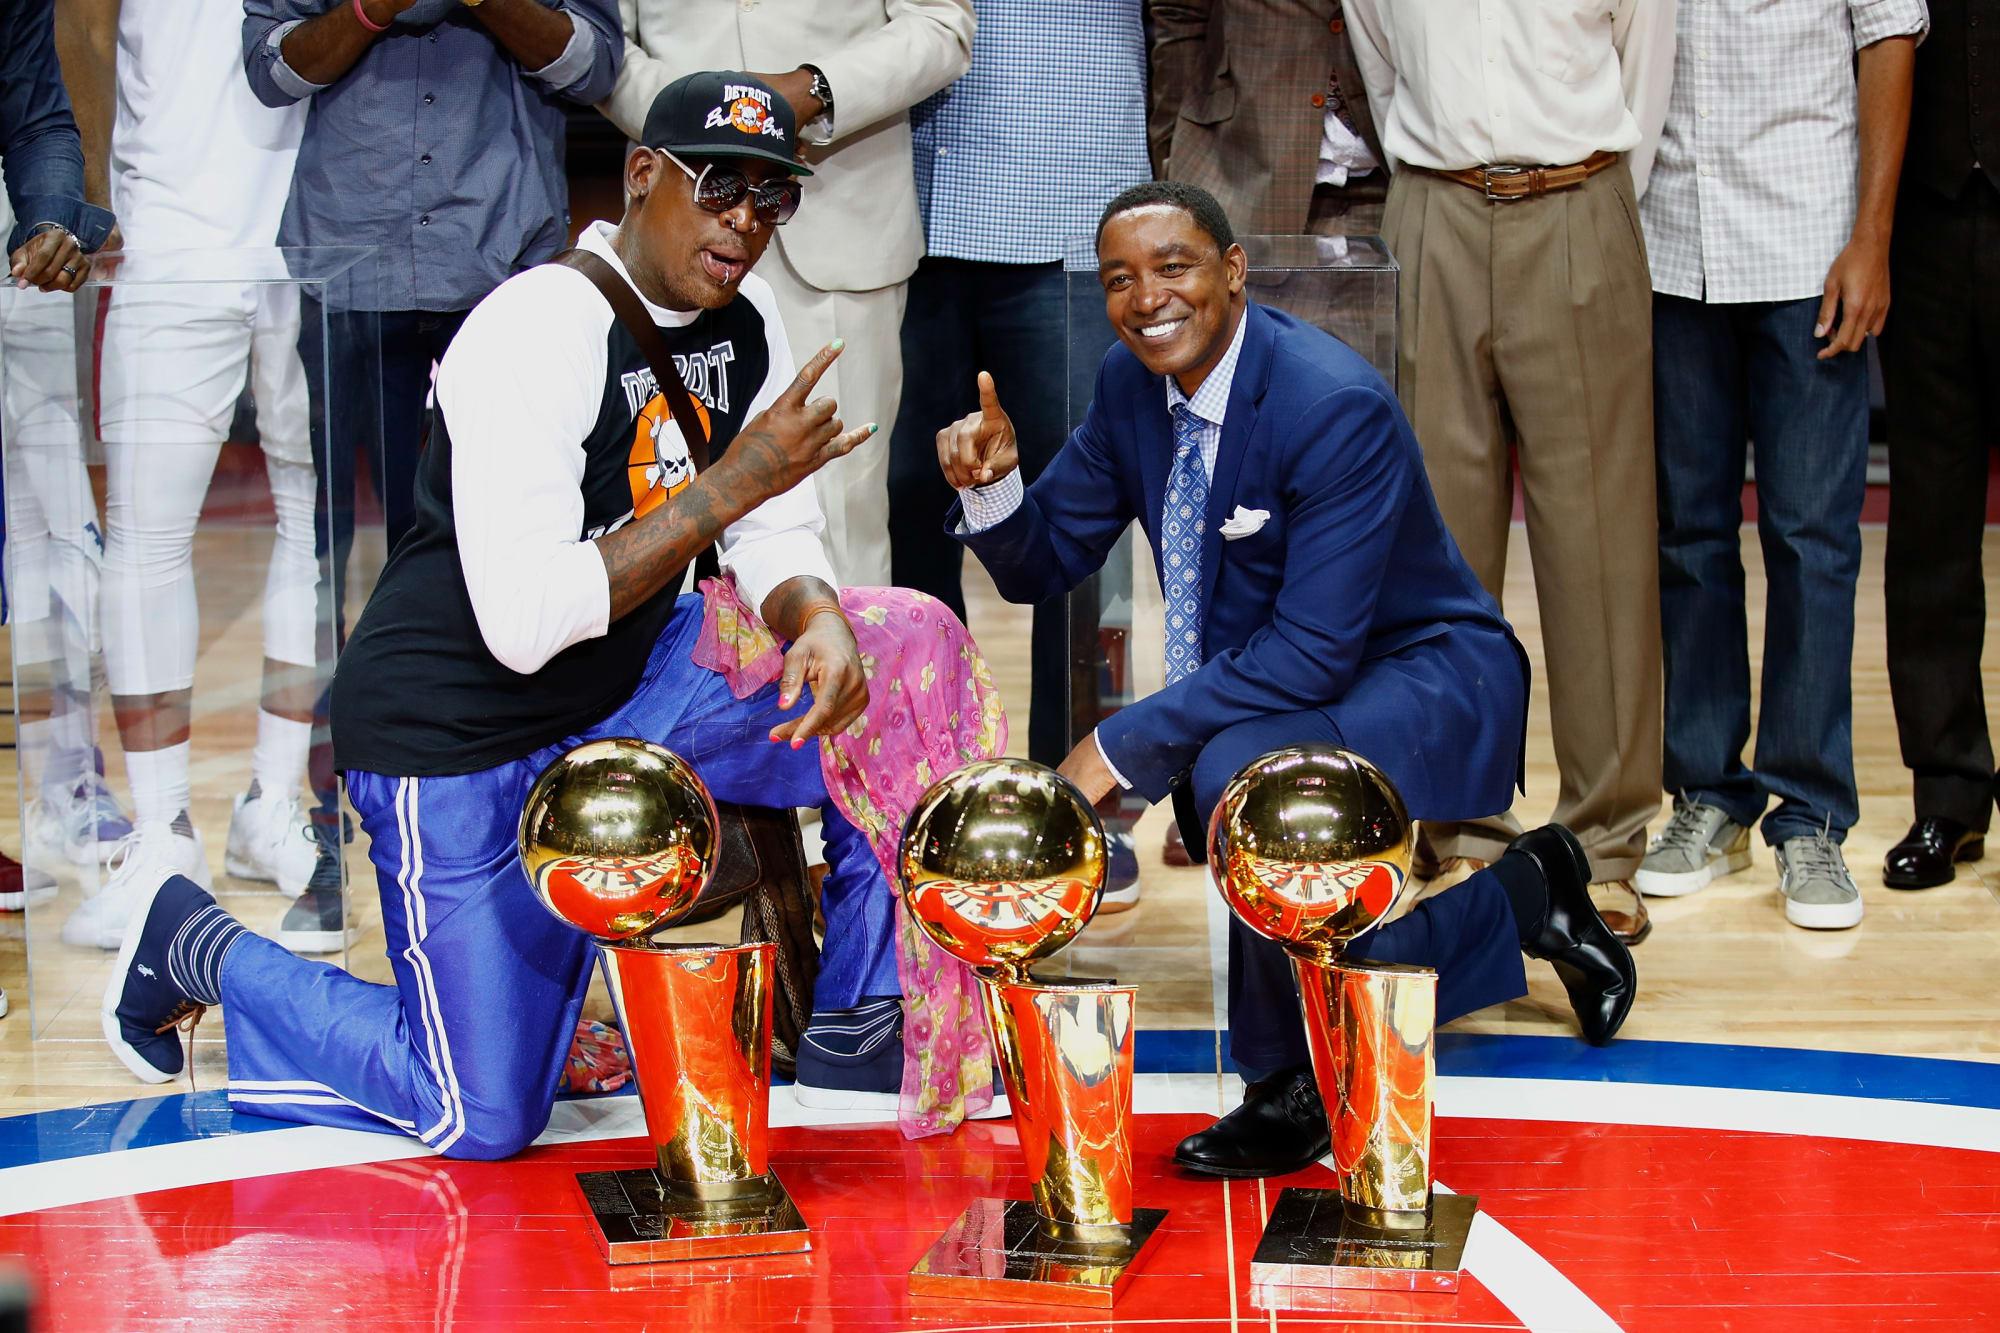 4 Detroit Pistons make the NBA's 75 greatest players list